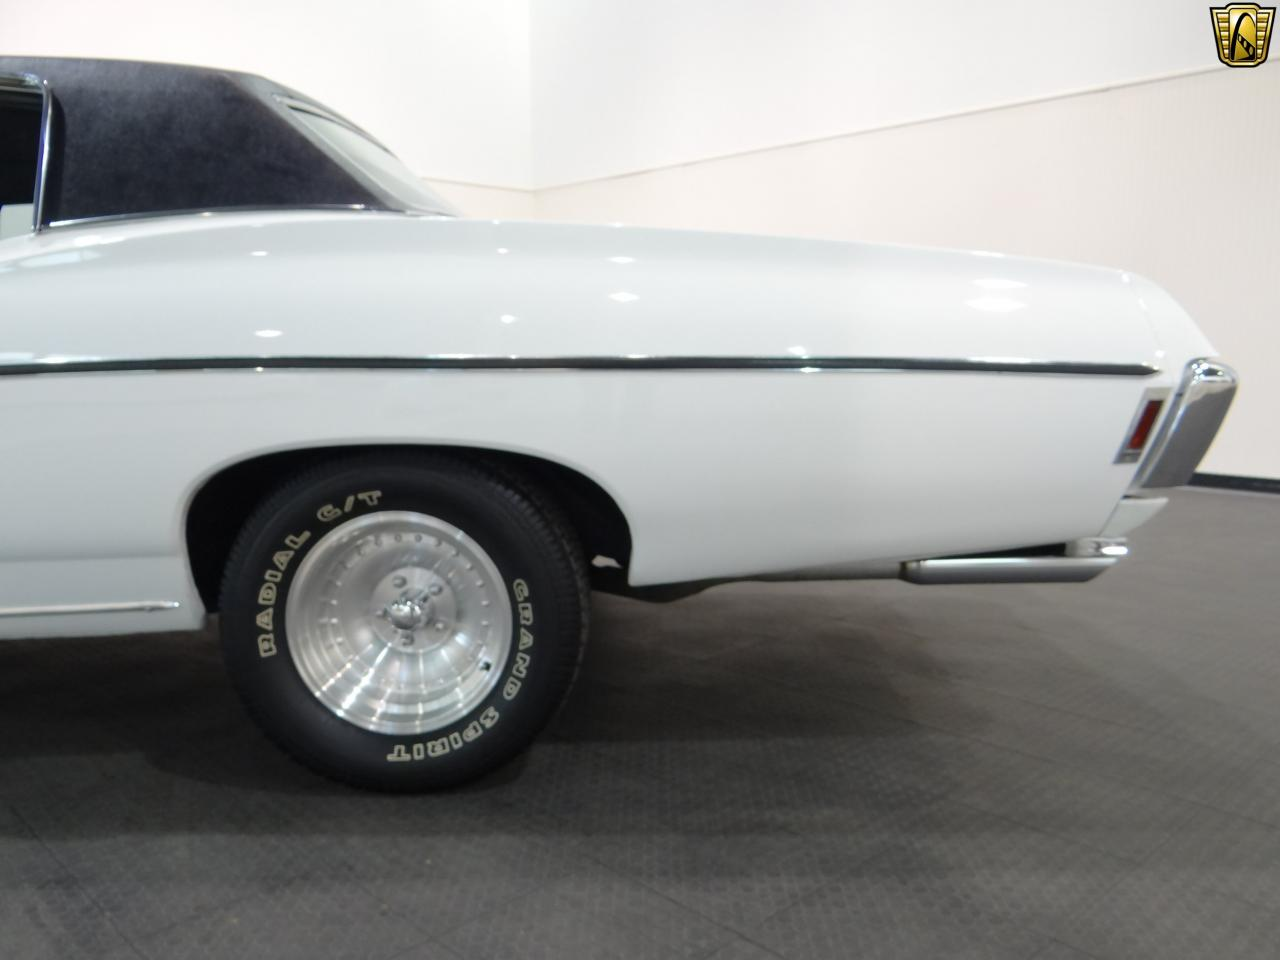 1968 Chevrolet Impala Ss 37865 Miles White 2dr 427 Cid V8 3 Speed Chevy Automatic